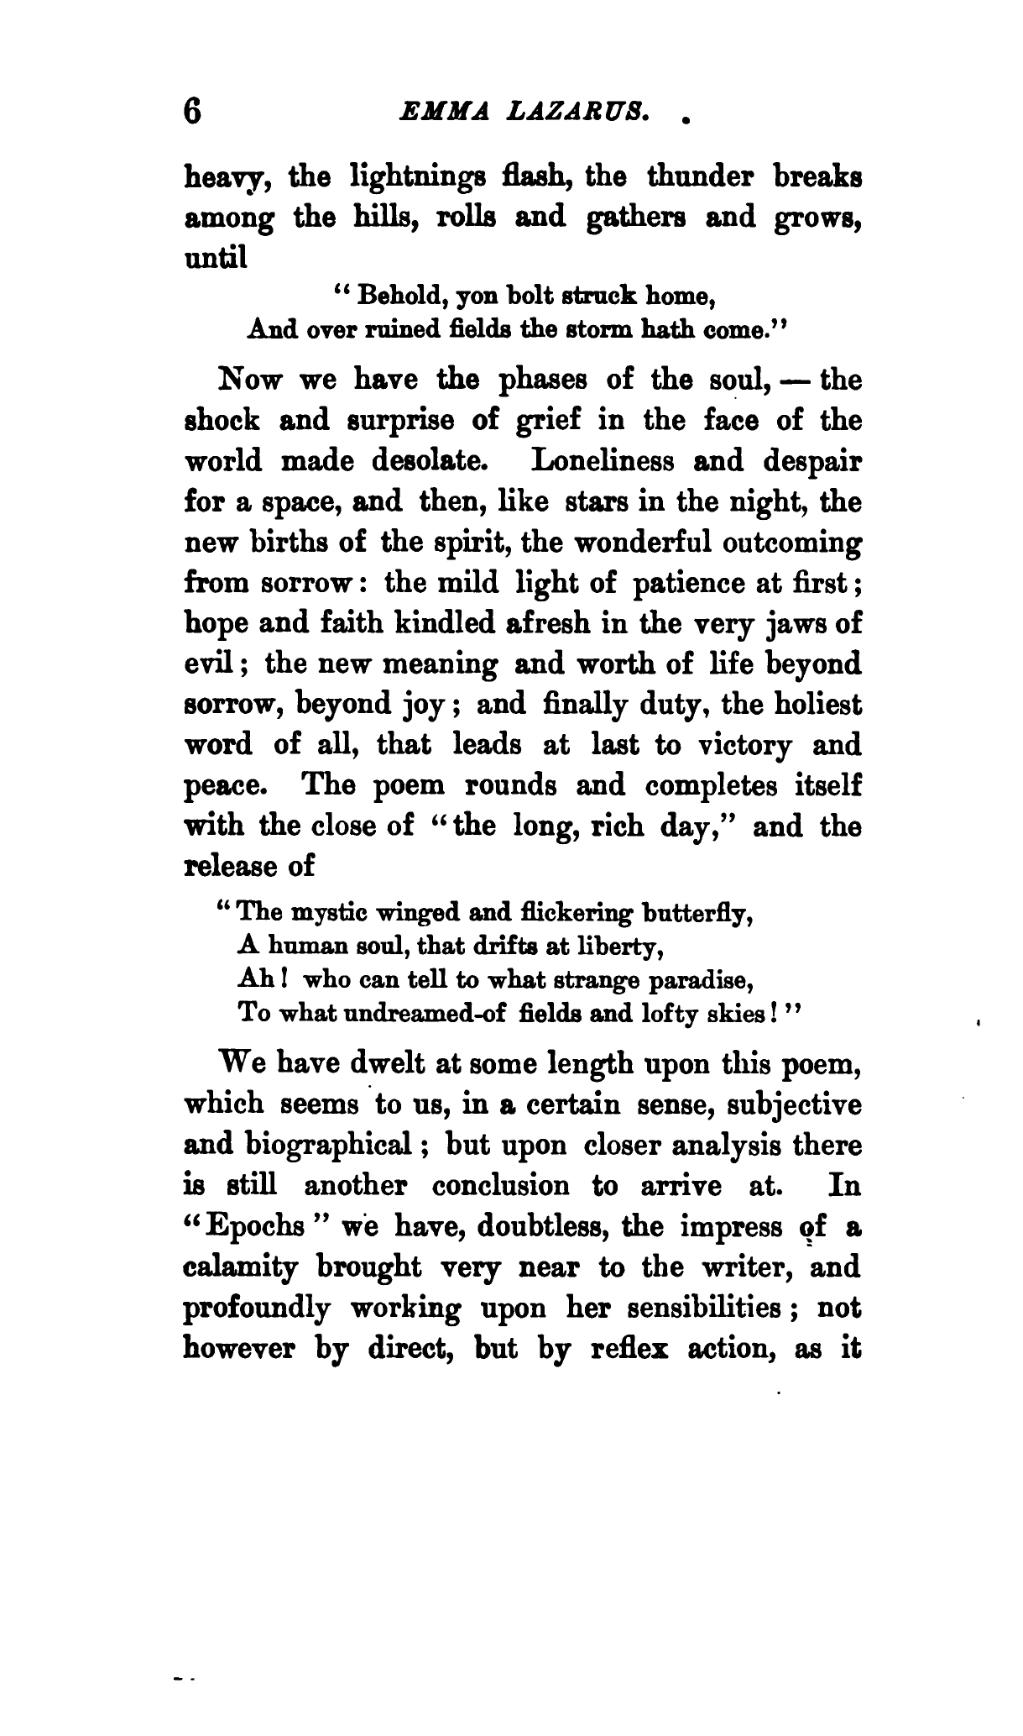 Pagepoems Of Emma Lazarus Vol 1djvu21 Wikisource The